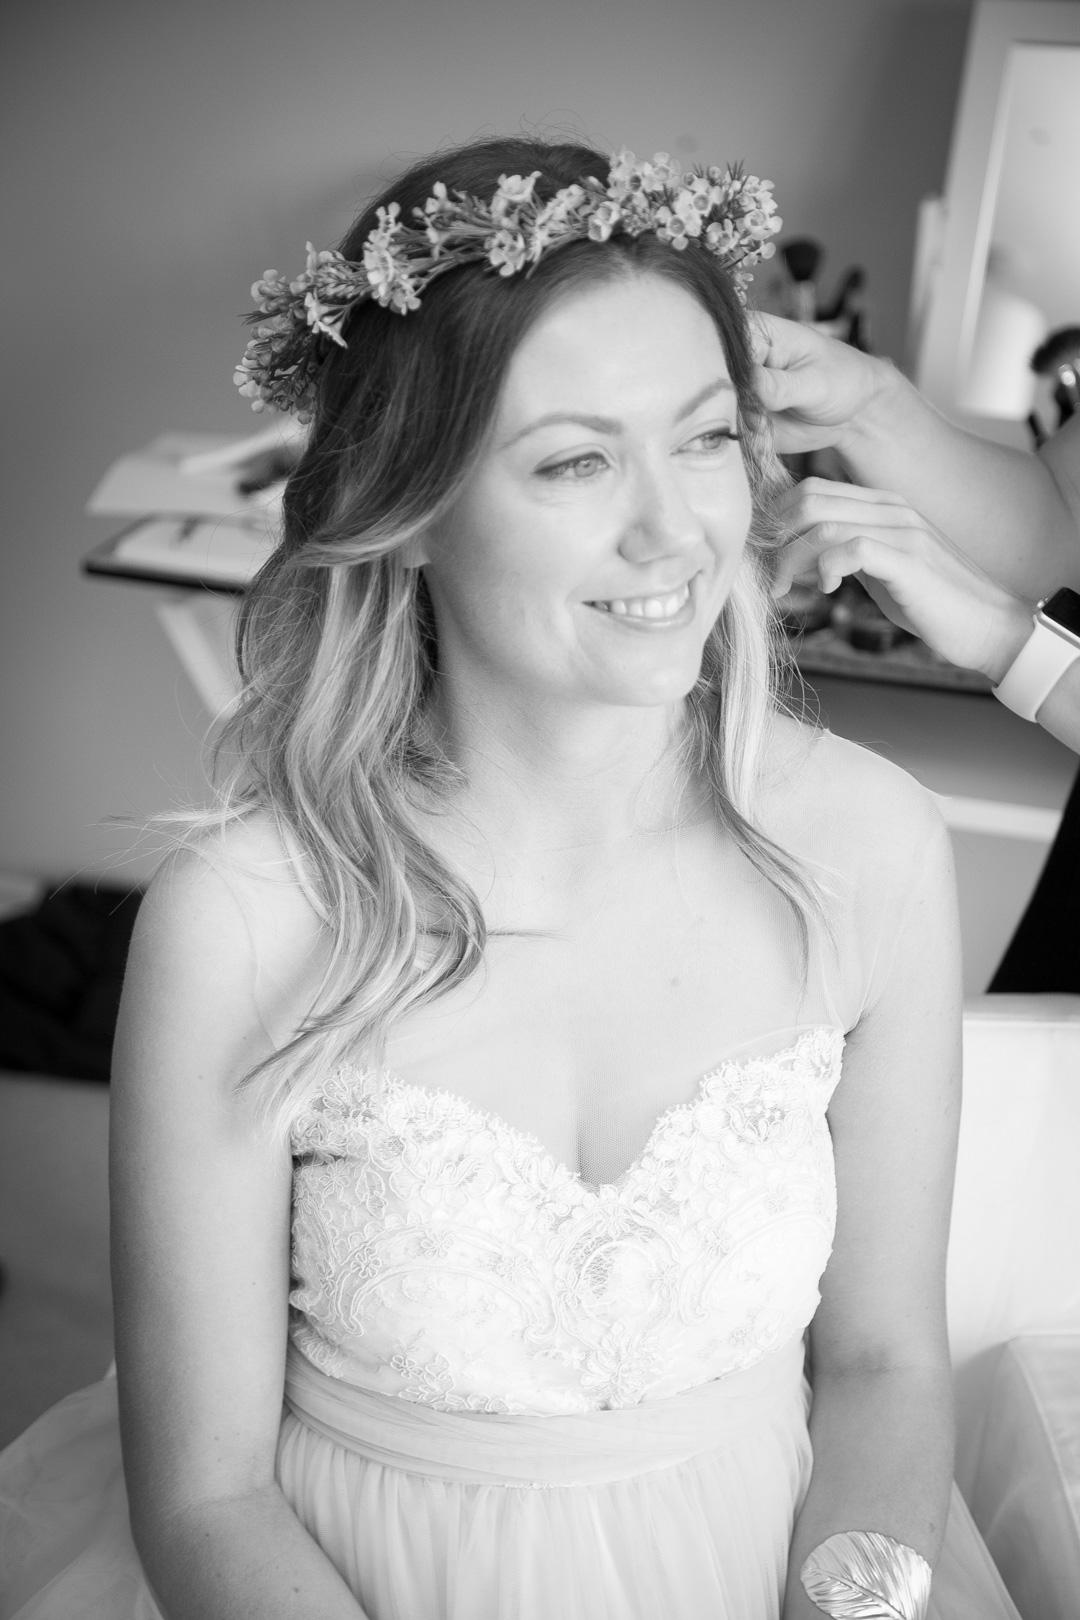 boho-bride-sara-and-tims-festival-wedding-joe-buford-photography